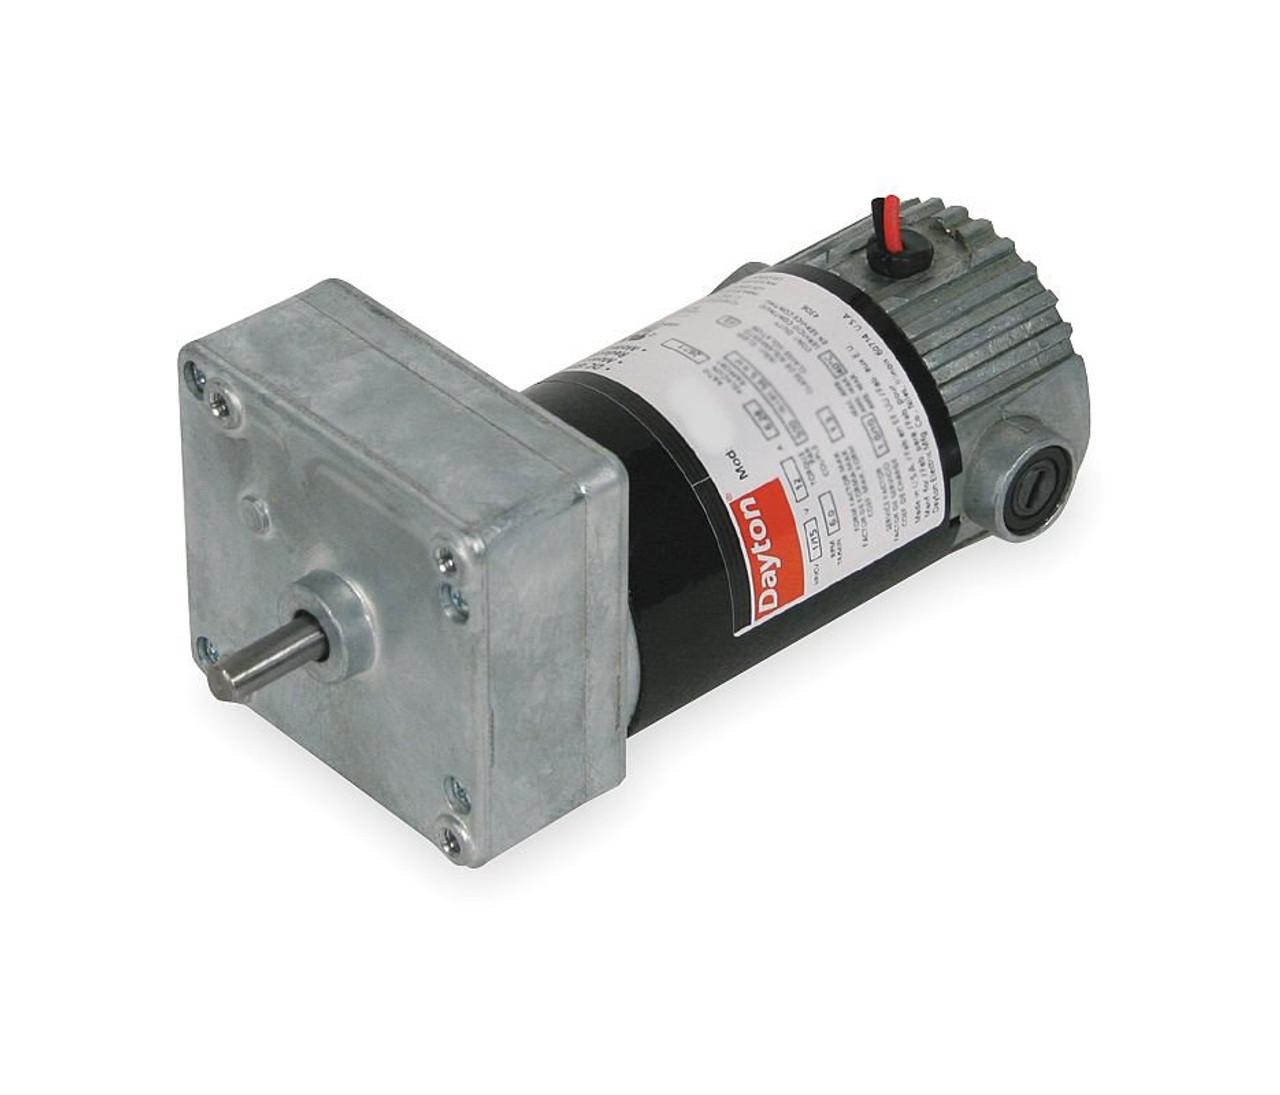 4Z535 Dayton Model 1LPW1 DC Gear Motor 11 RPM 1//30 hp 90VDC